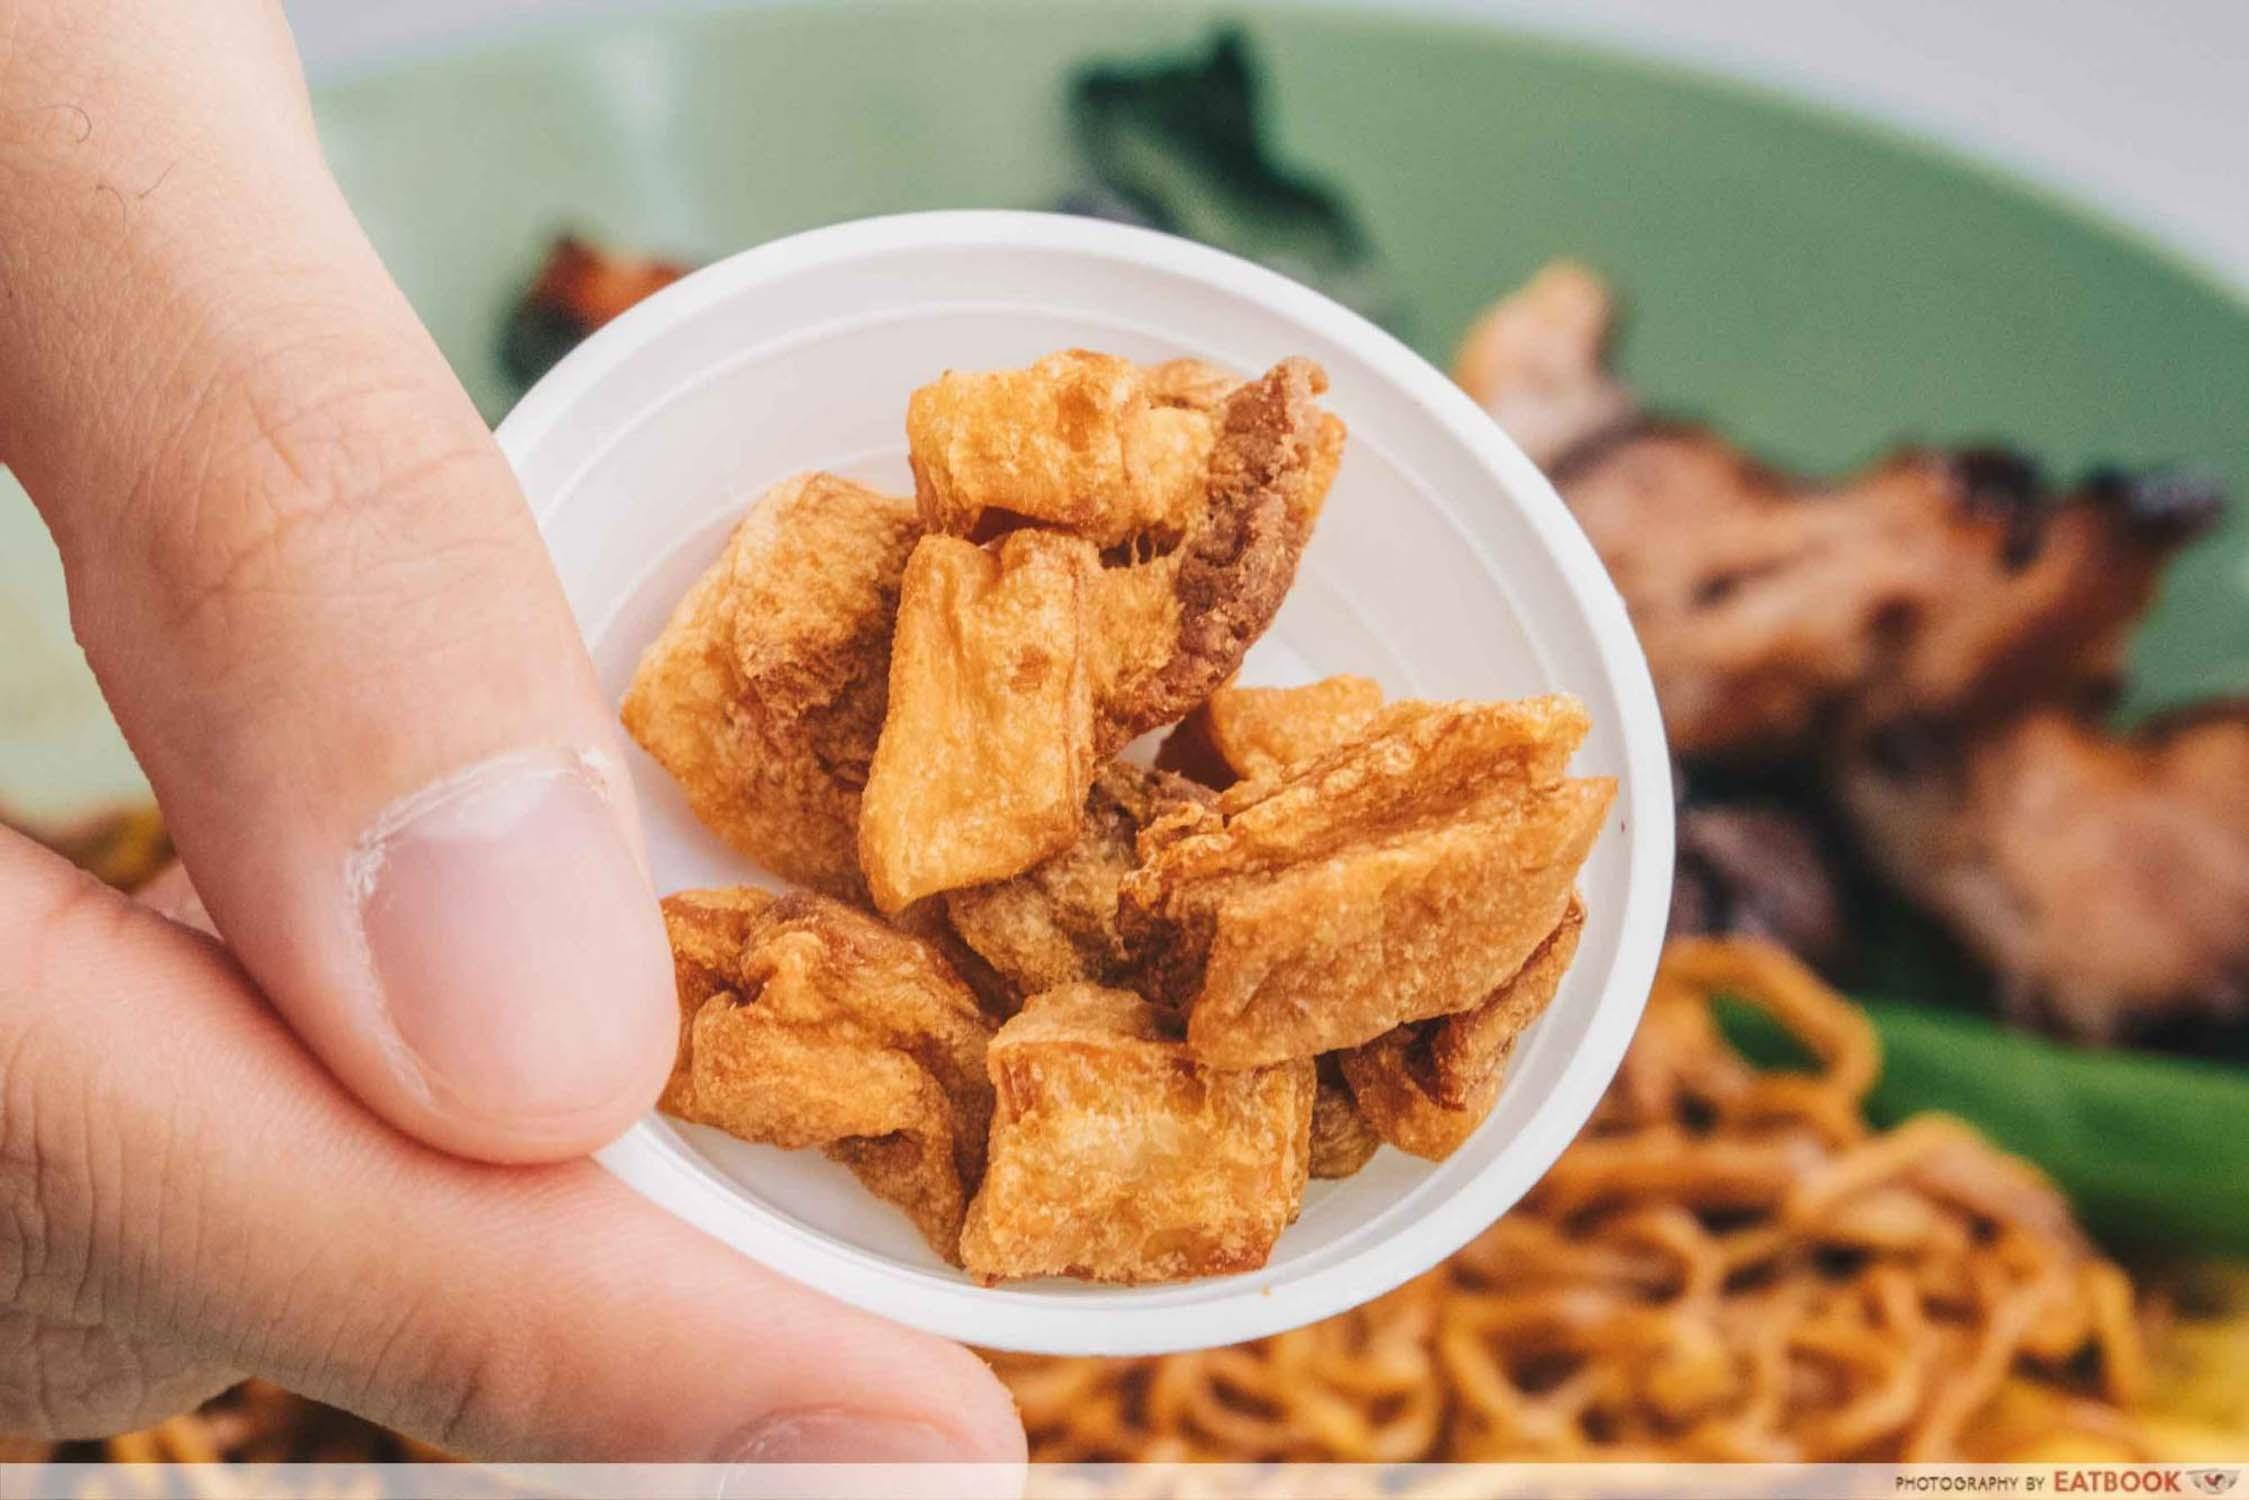 Cantonese Delights - Fried Pork Lard Closeup